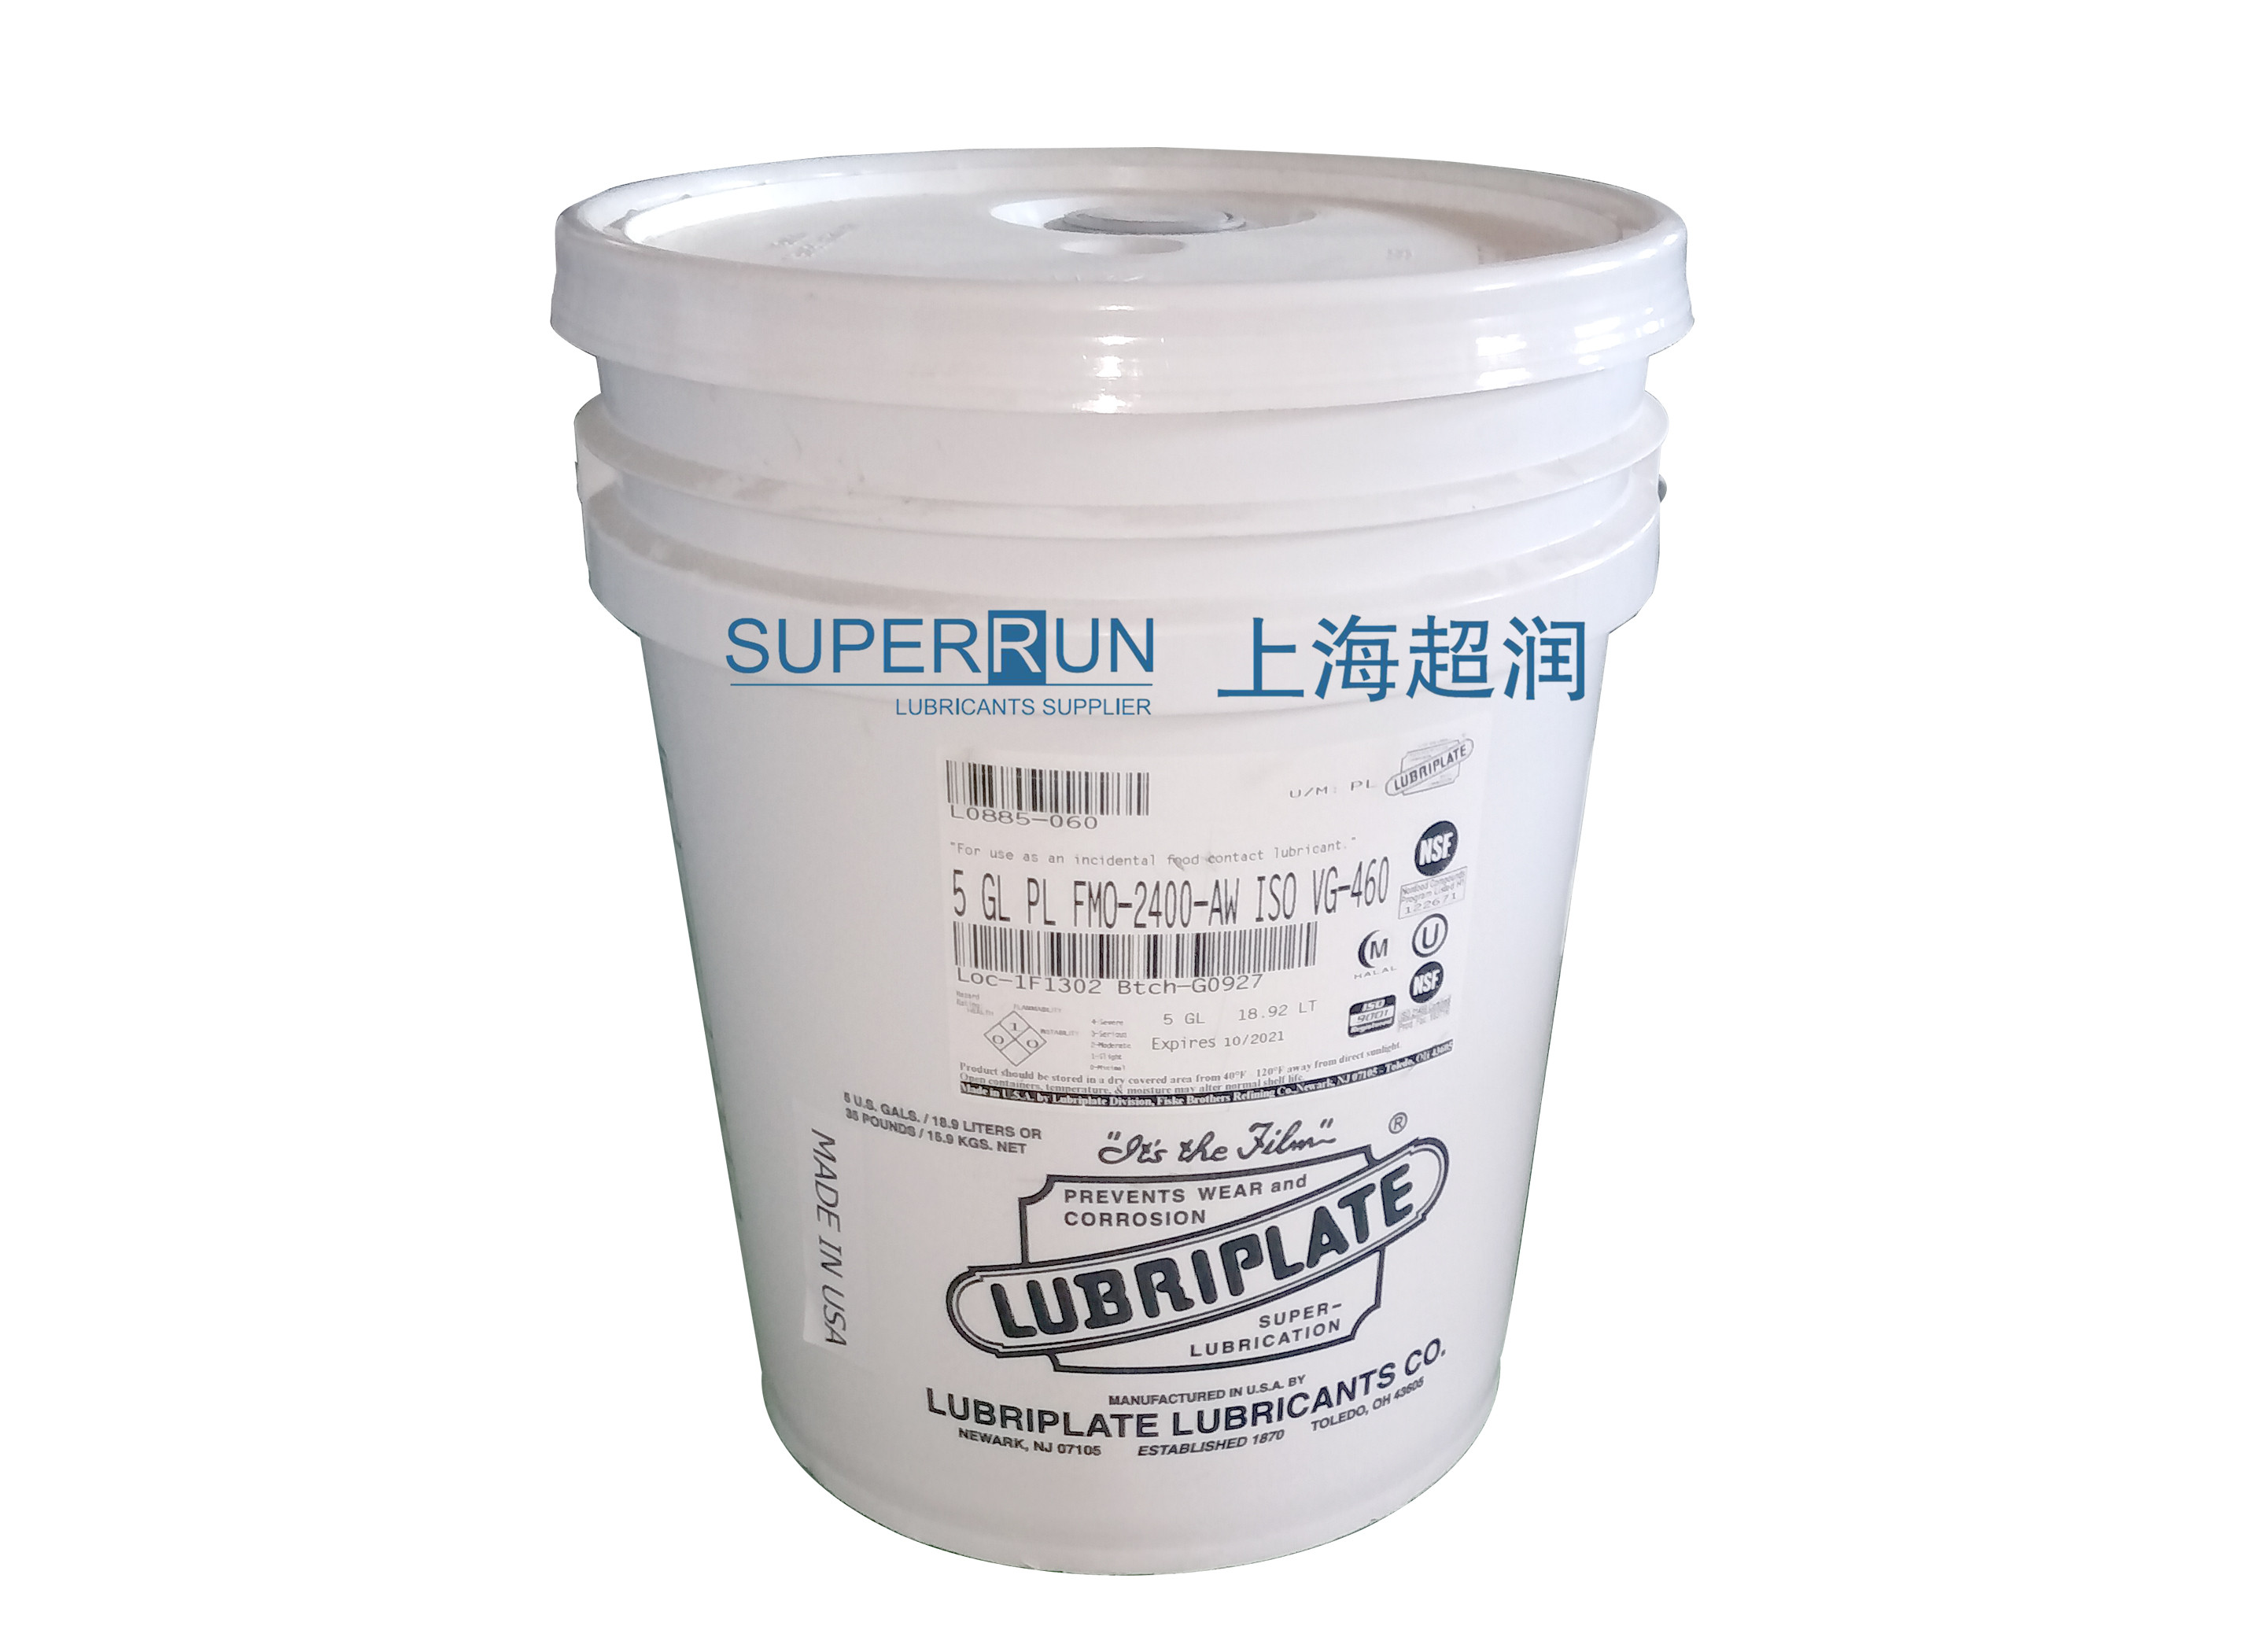 lubriplate fmo-2400-aw